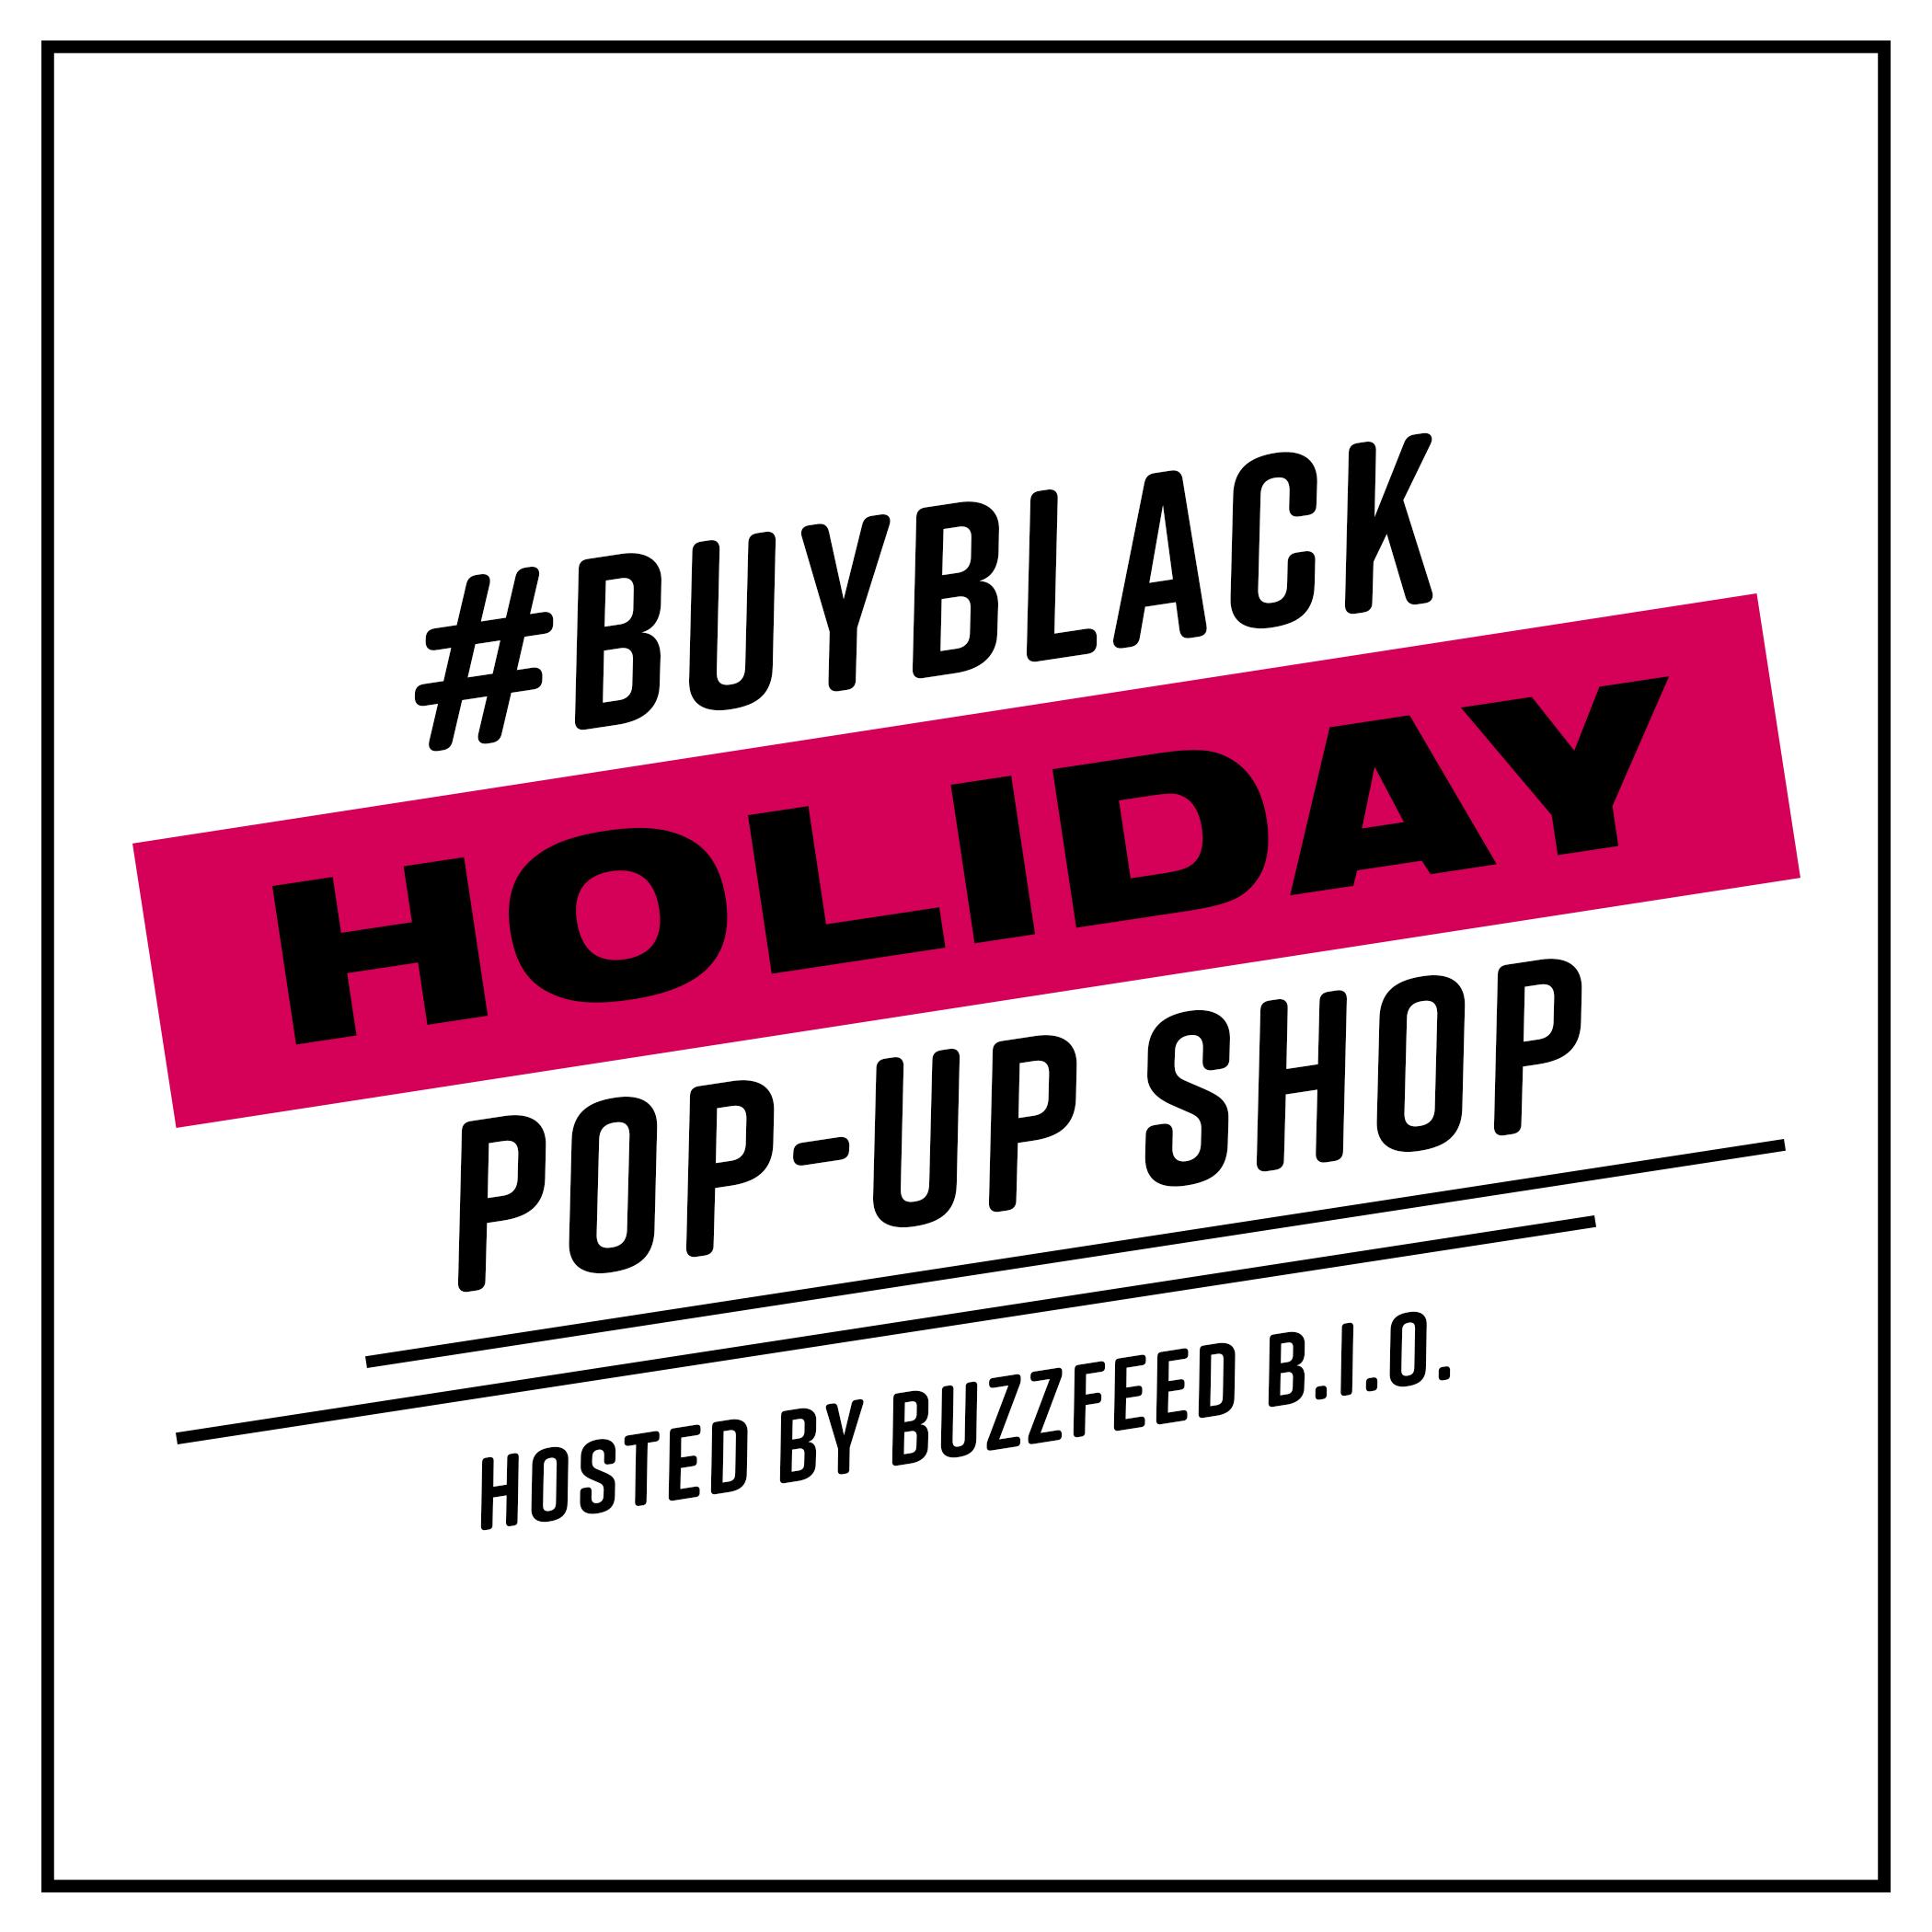 #BuyBlack Holiday Pop-Up Shop Logo.png